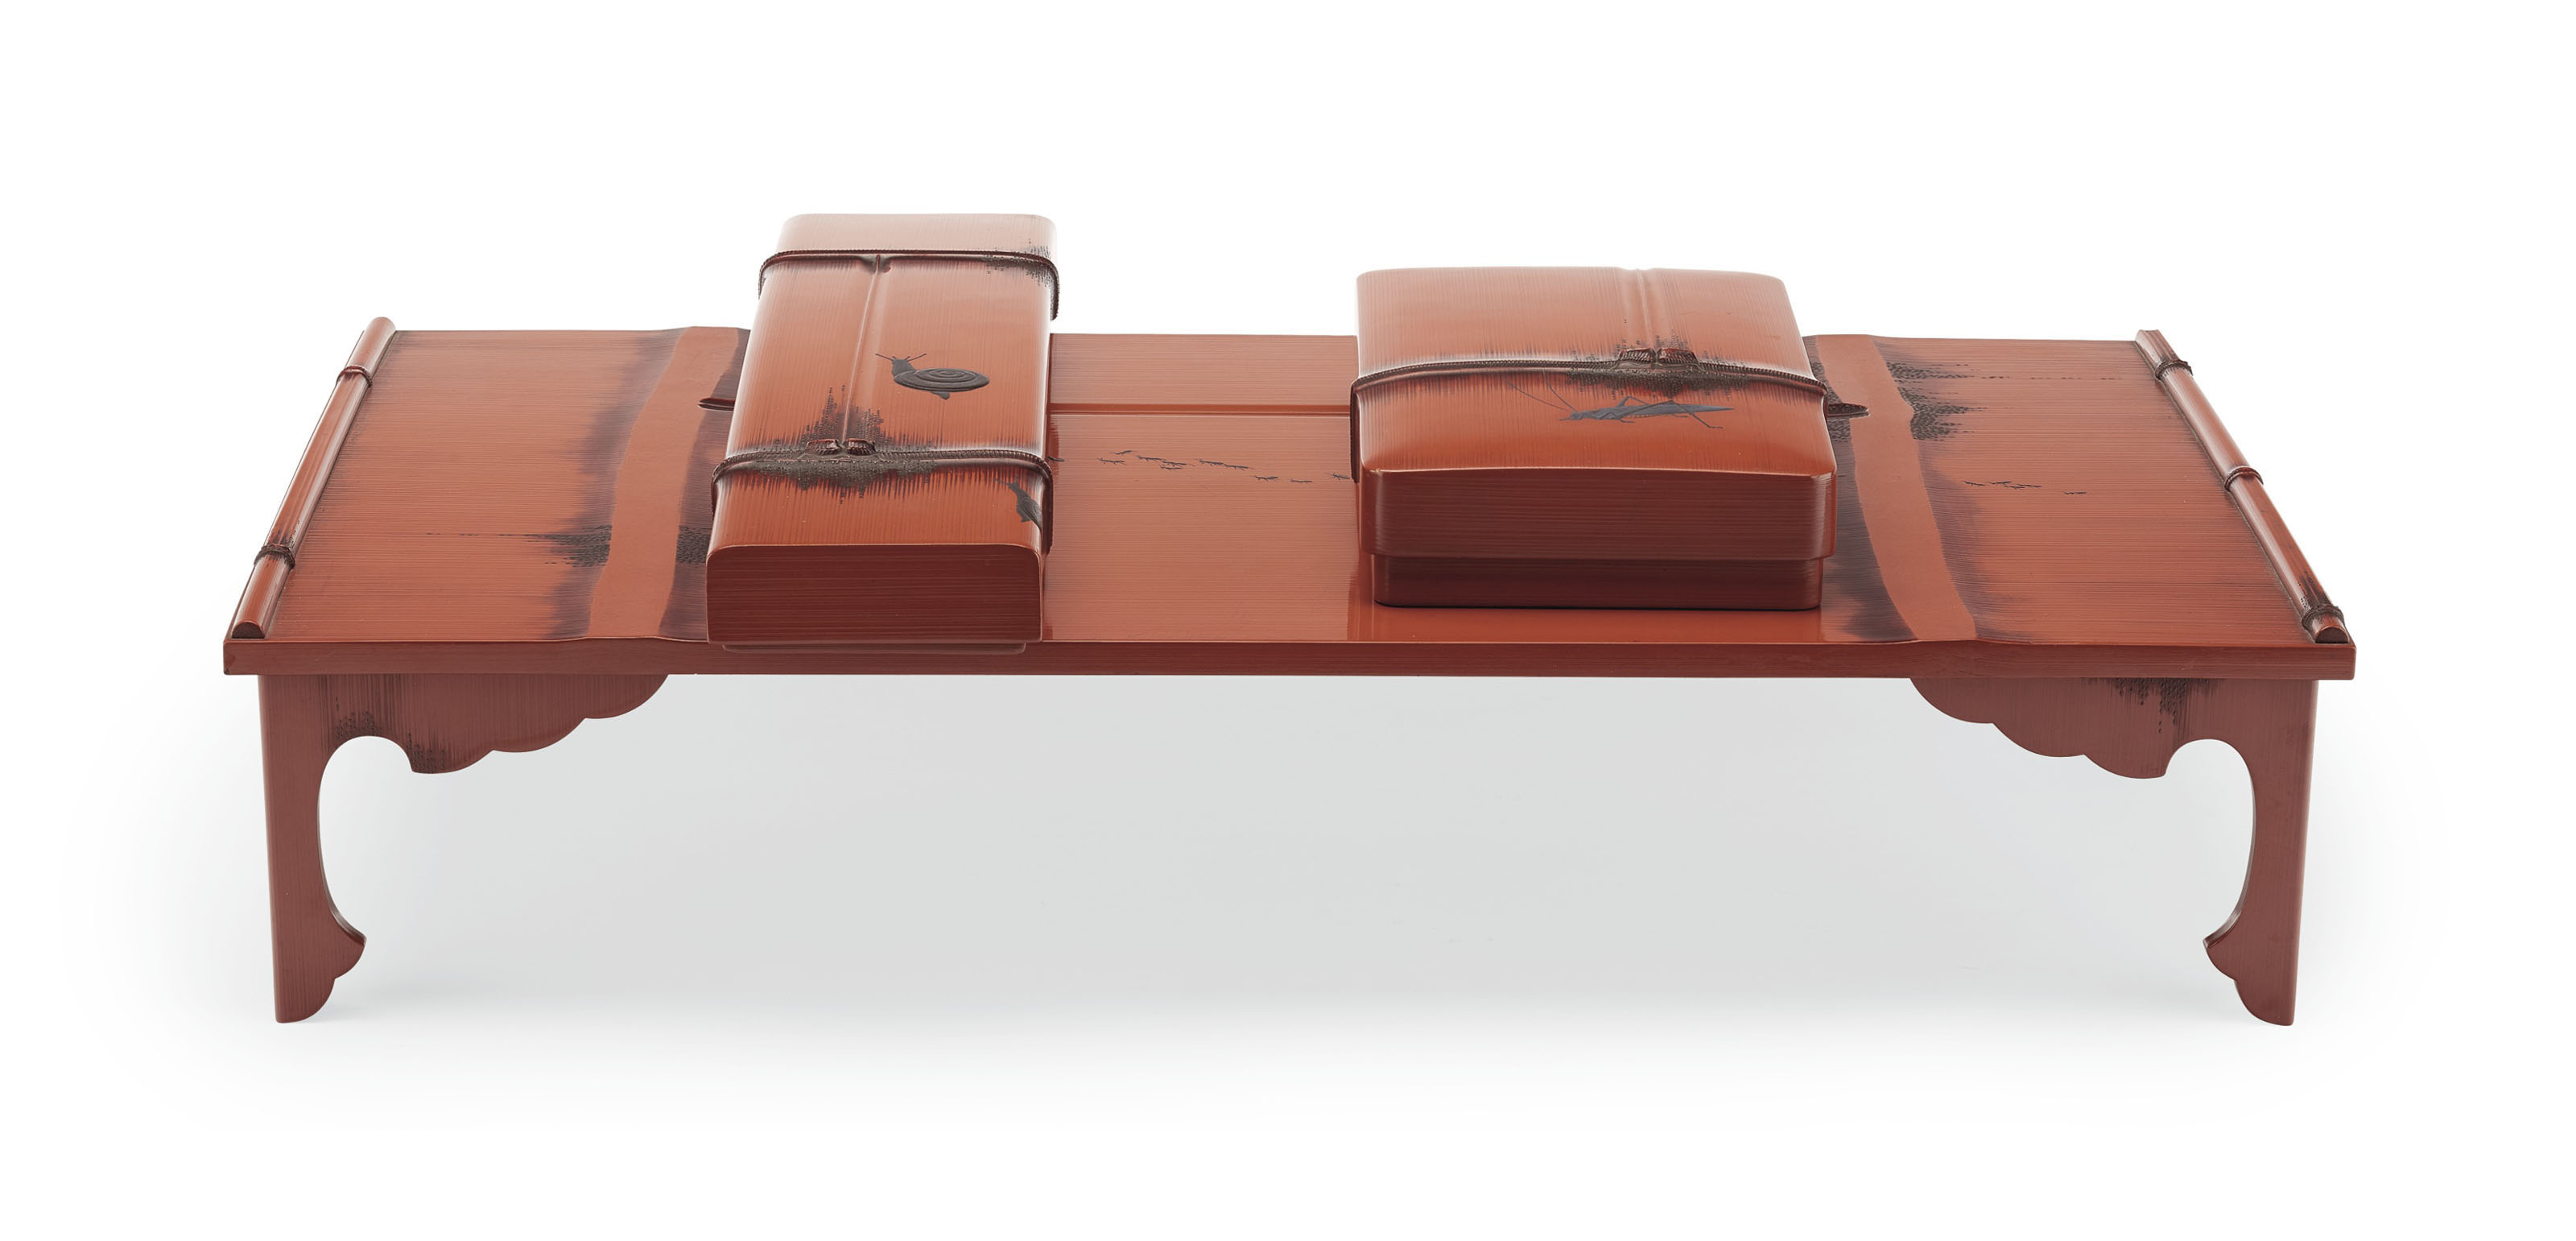 A SET OF WRITING TABLE (BUNDAI), WRITING BOX (SUZURIBAKO) AND PAPER BOX (FUBAKO)